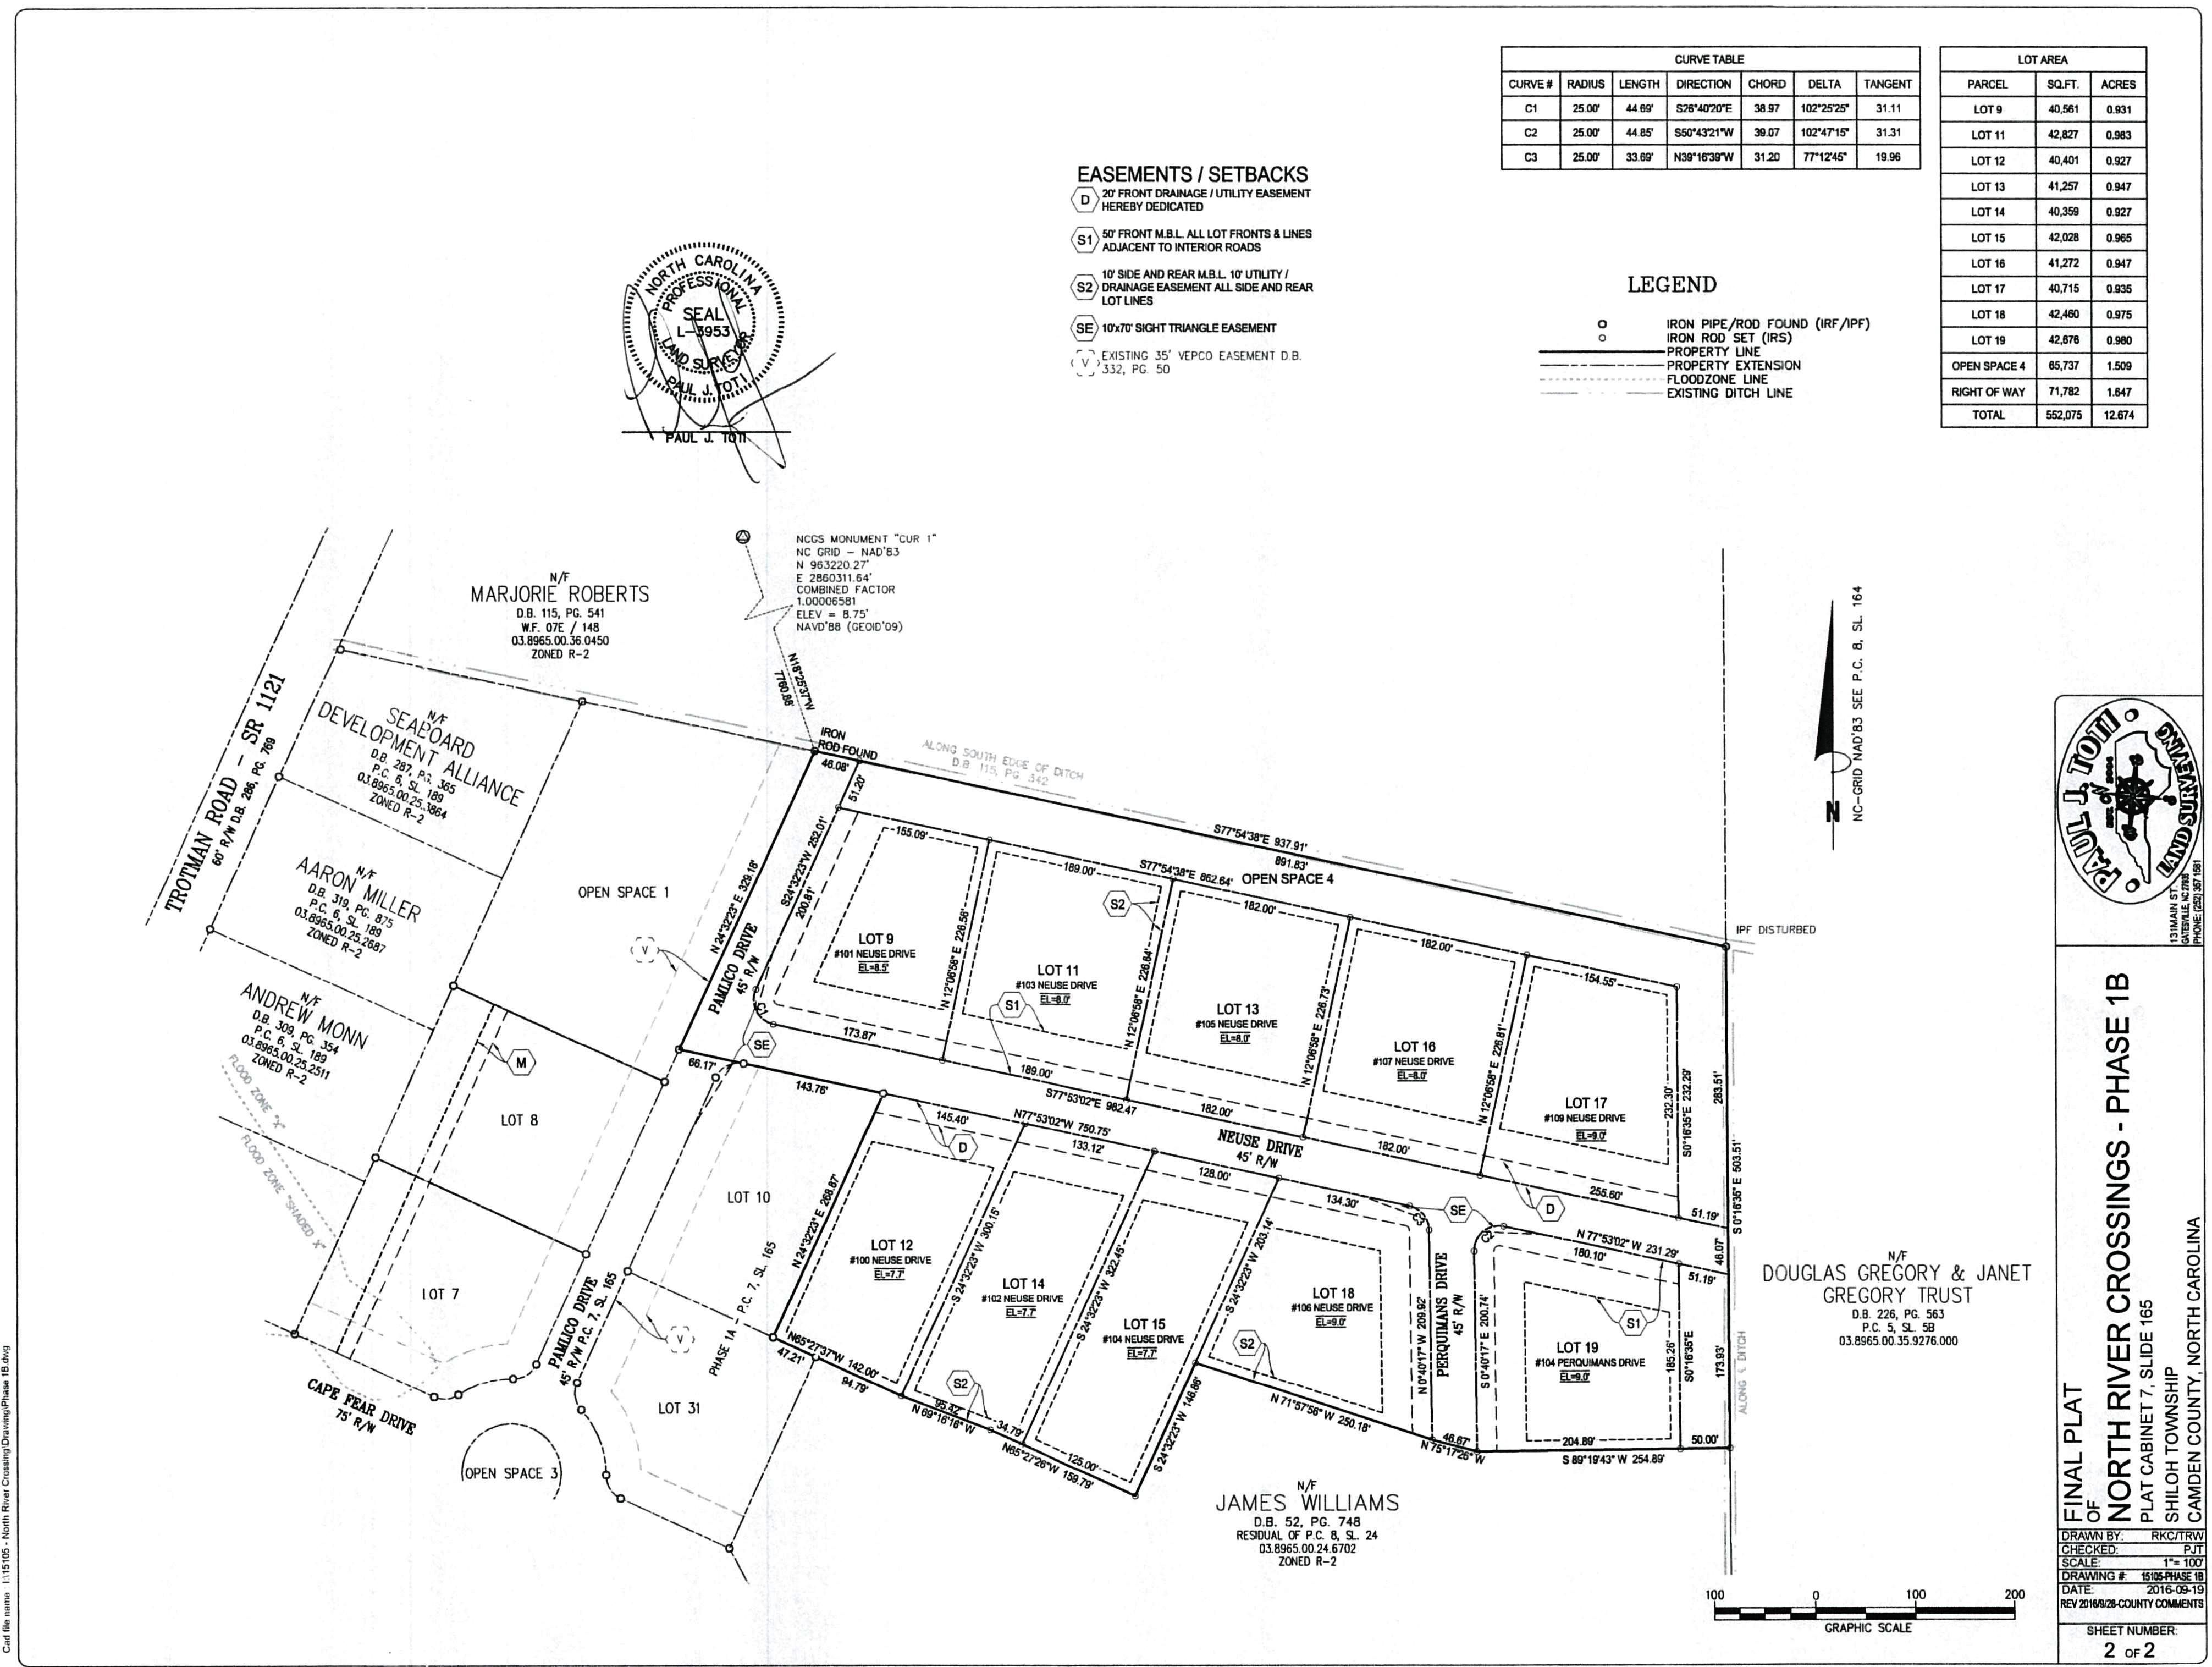 odmor gmc fuse box diagram 2011 diagram of a 1993 mercedes